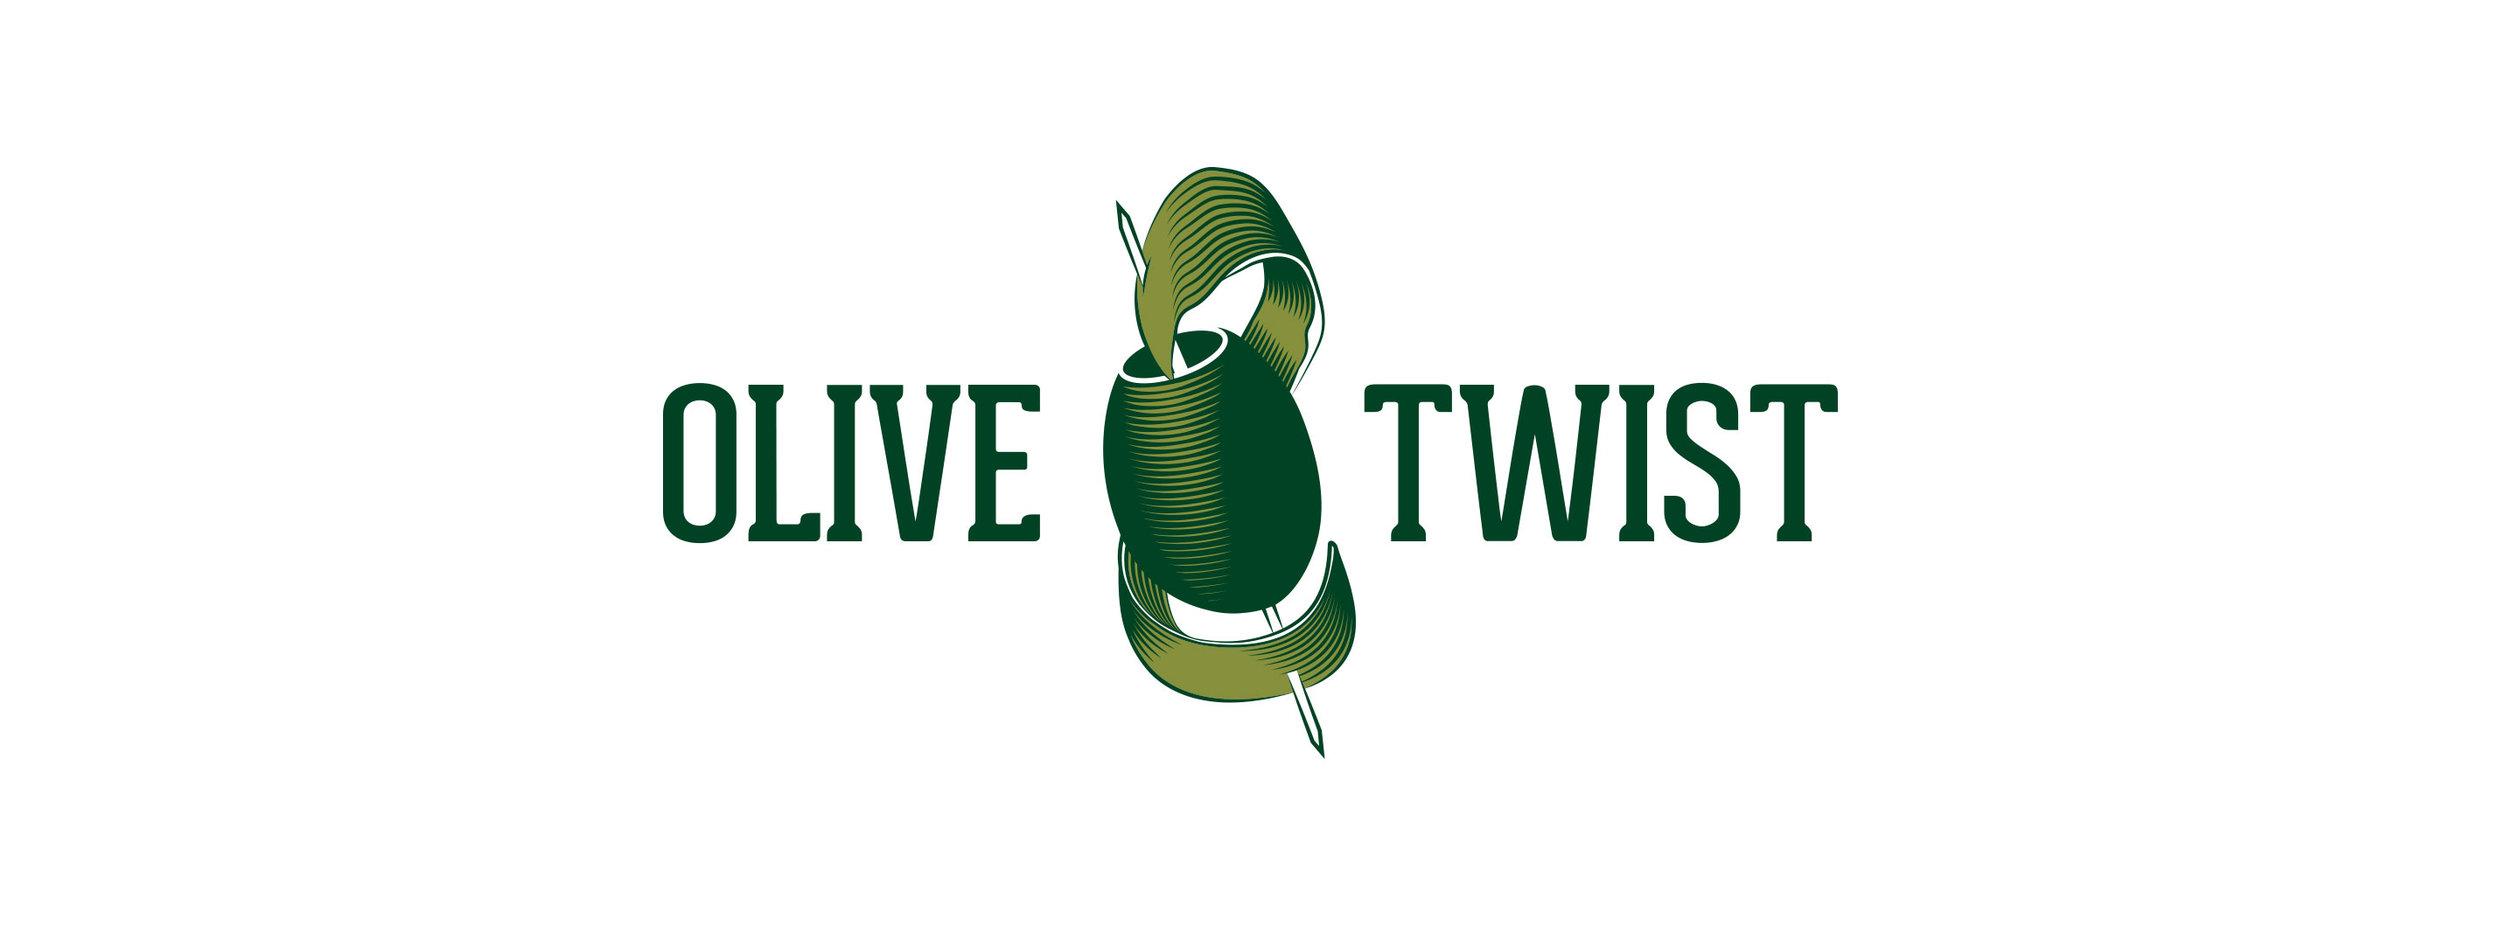 Studio-Eighty-Seven-Logo-Design-Olive-And-Twist-1.jpg